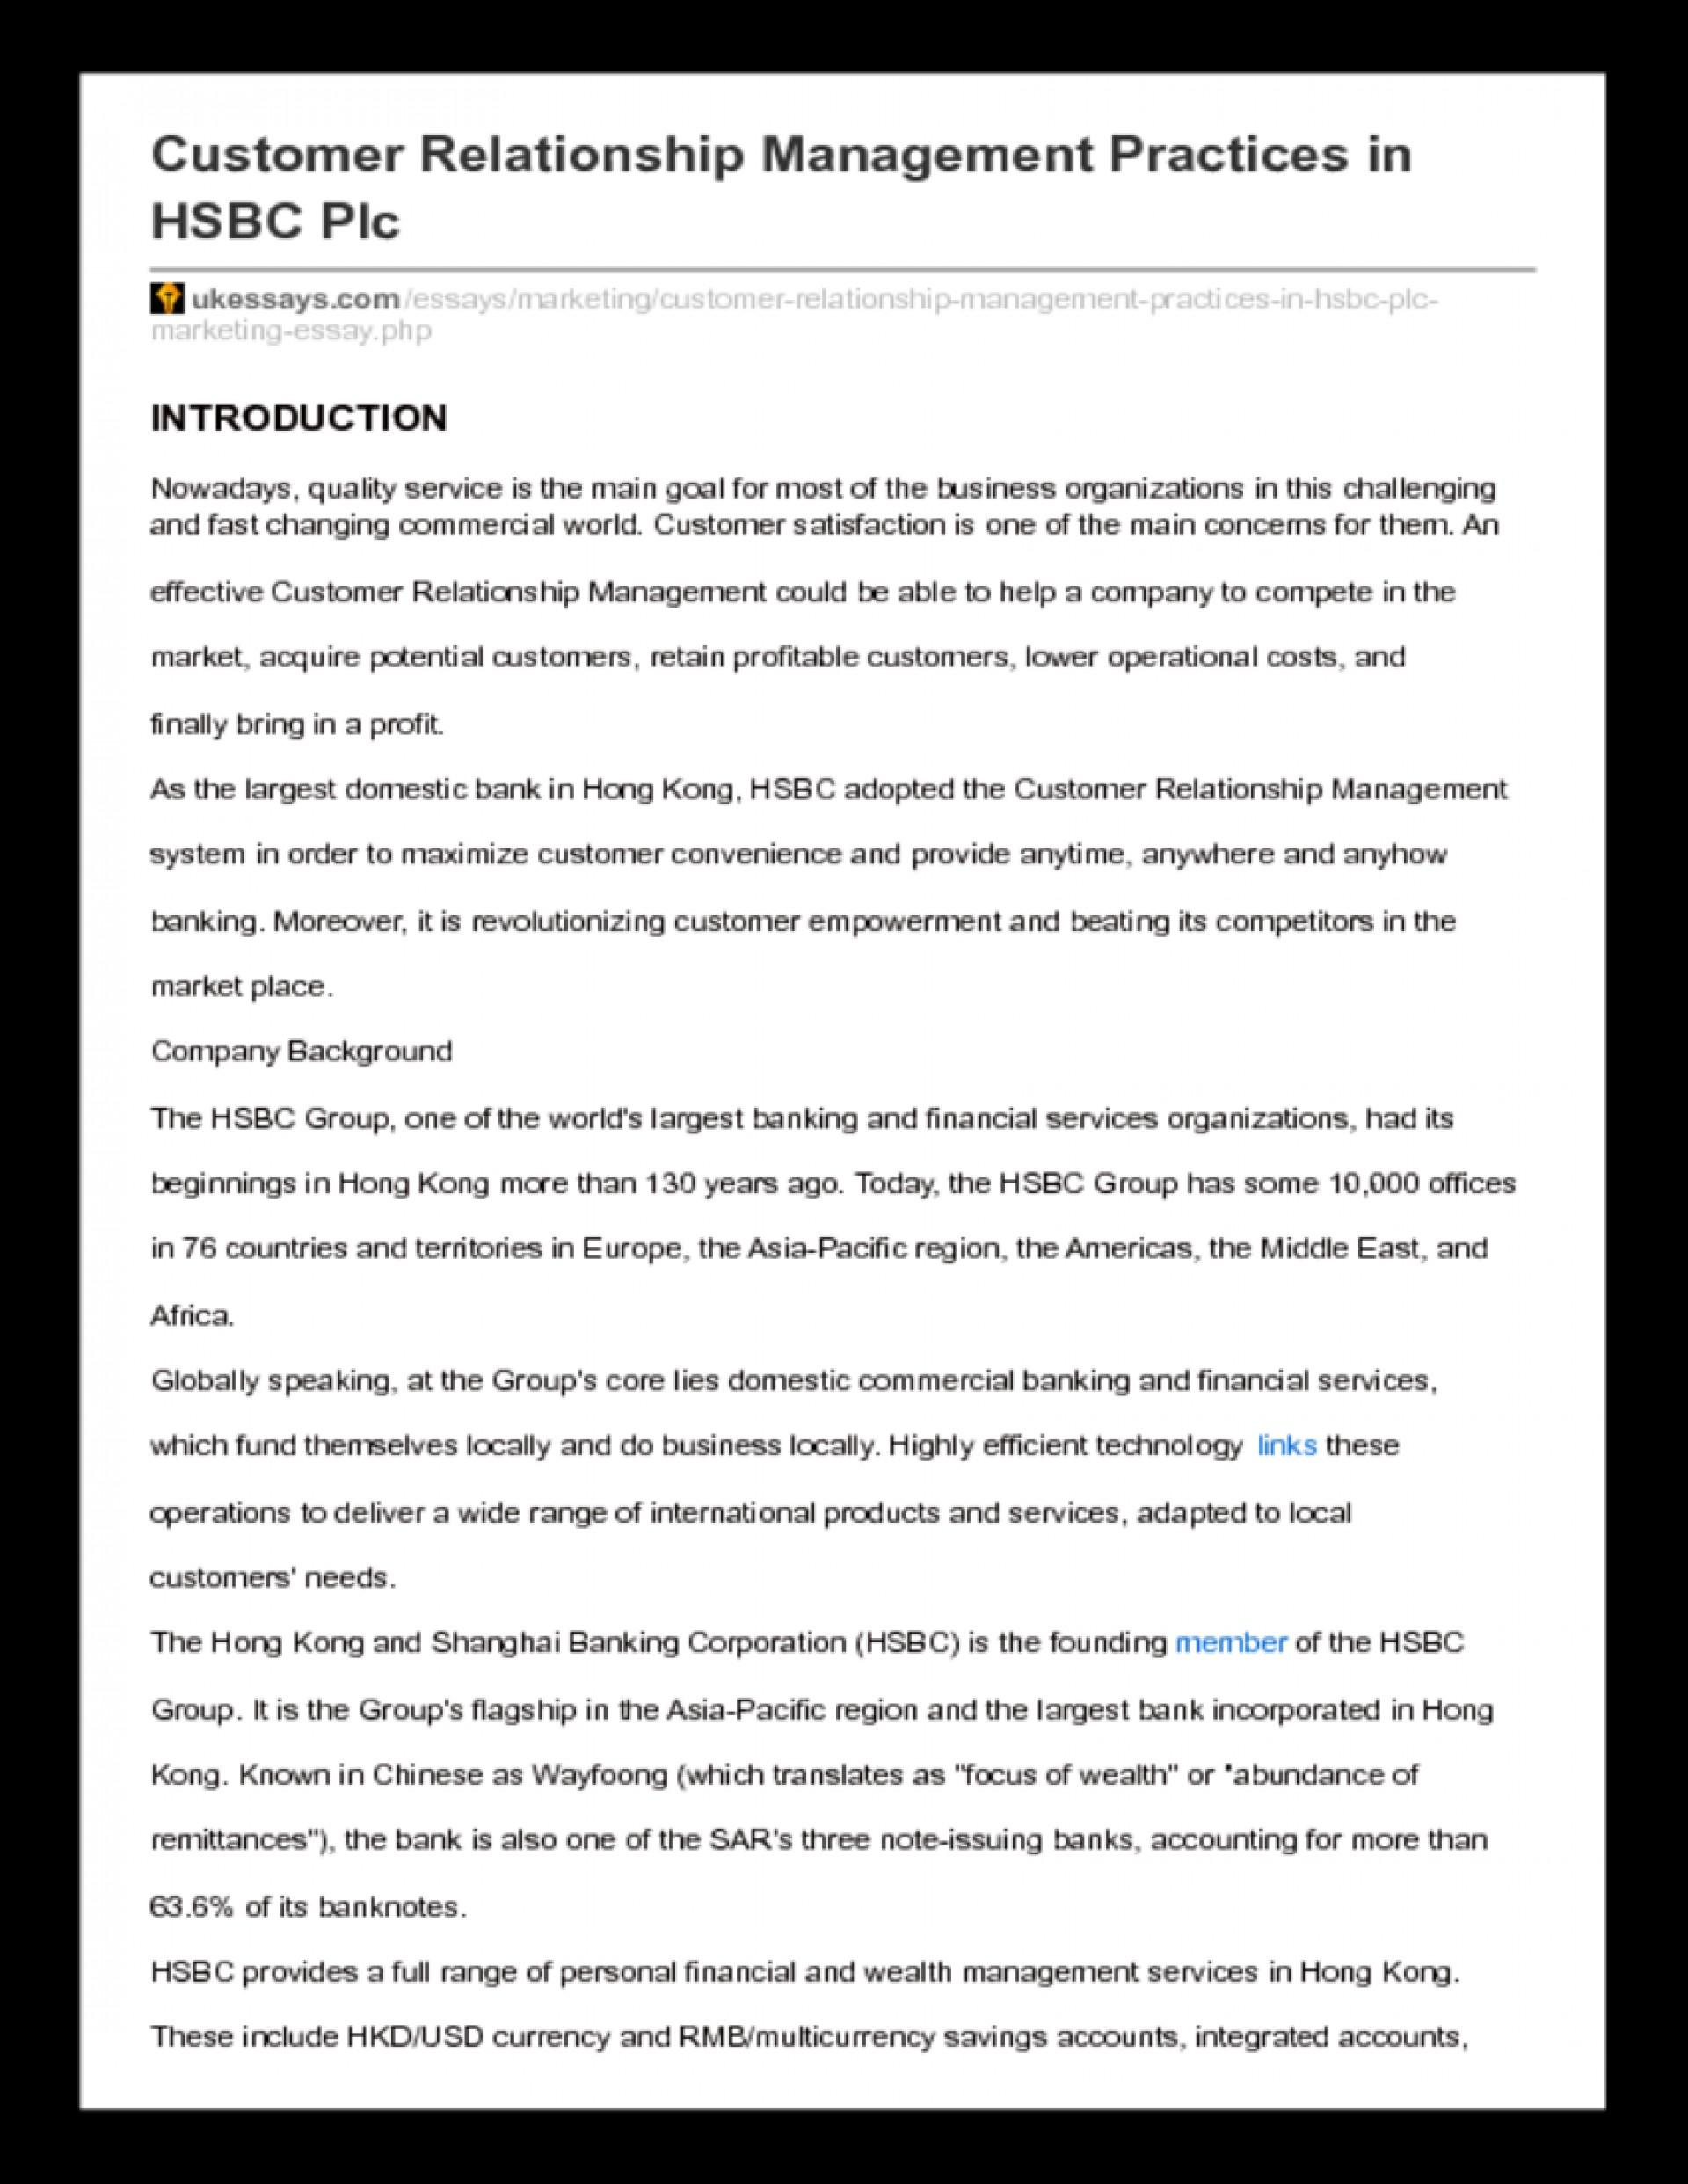 022 Essay Example Uk Essays Customer20relationship20management20class20notes 258461120 Ukessays Com Customer Relationship Management Practices In Hsbc Stupendous New Reviews Apa Login 1920